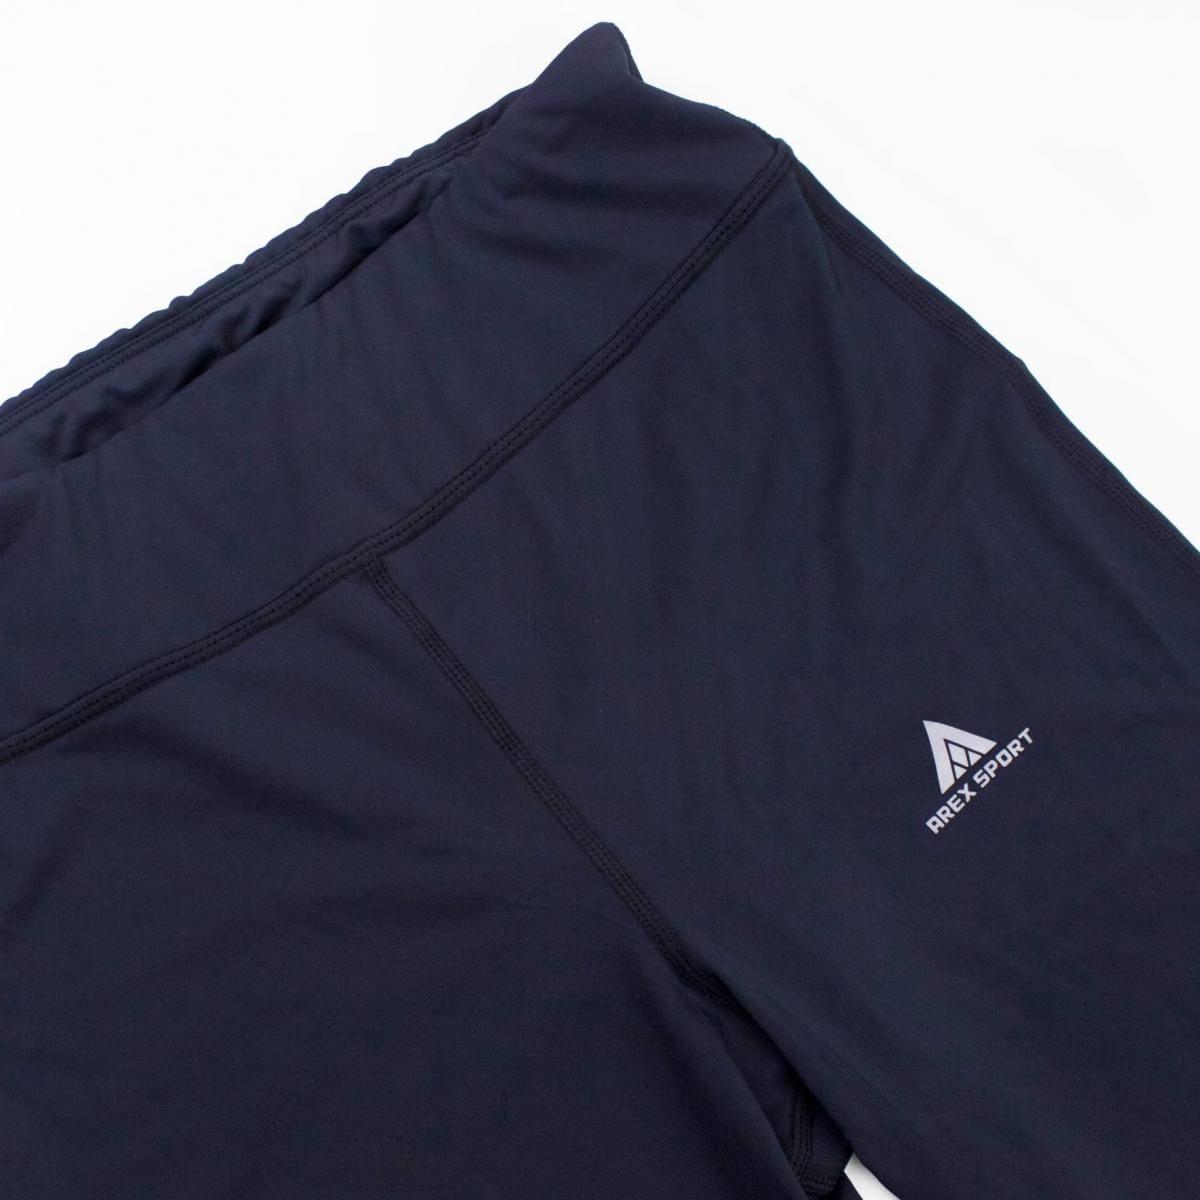 【AREXSPORT】輕量男女壓縮日著機能運動褲 10